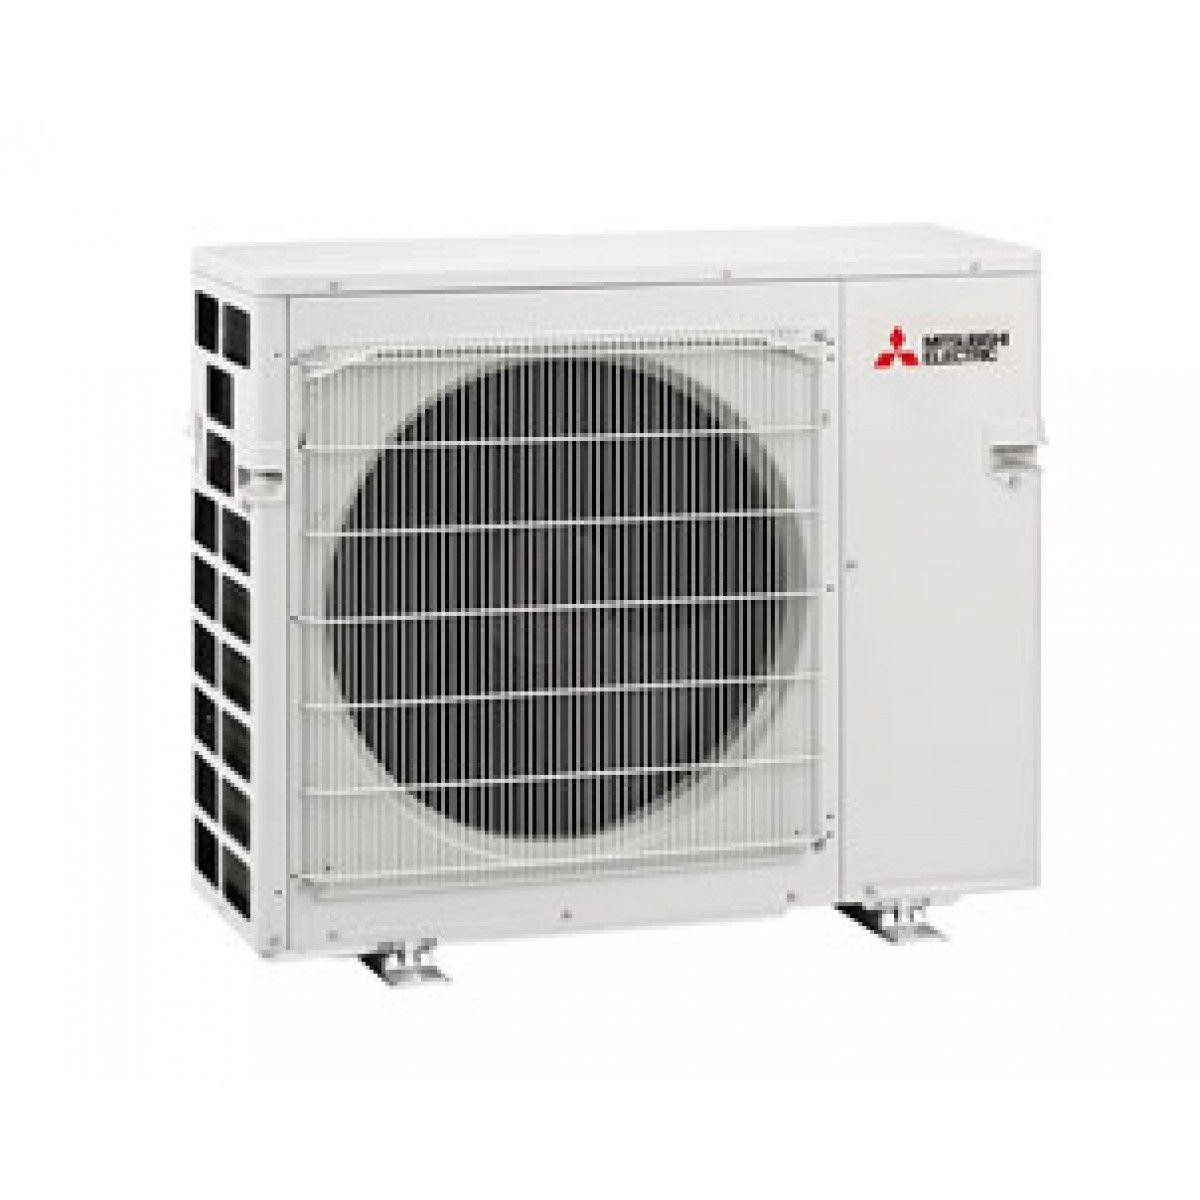 Mitsubishi Split Ac Review: MXZ-4A36NA Split Air Conditioning And Heating 36K Btu